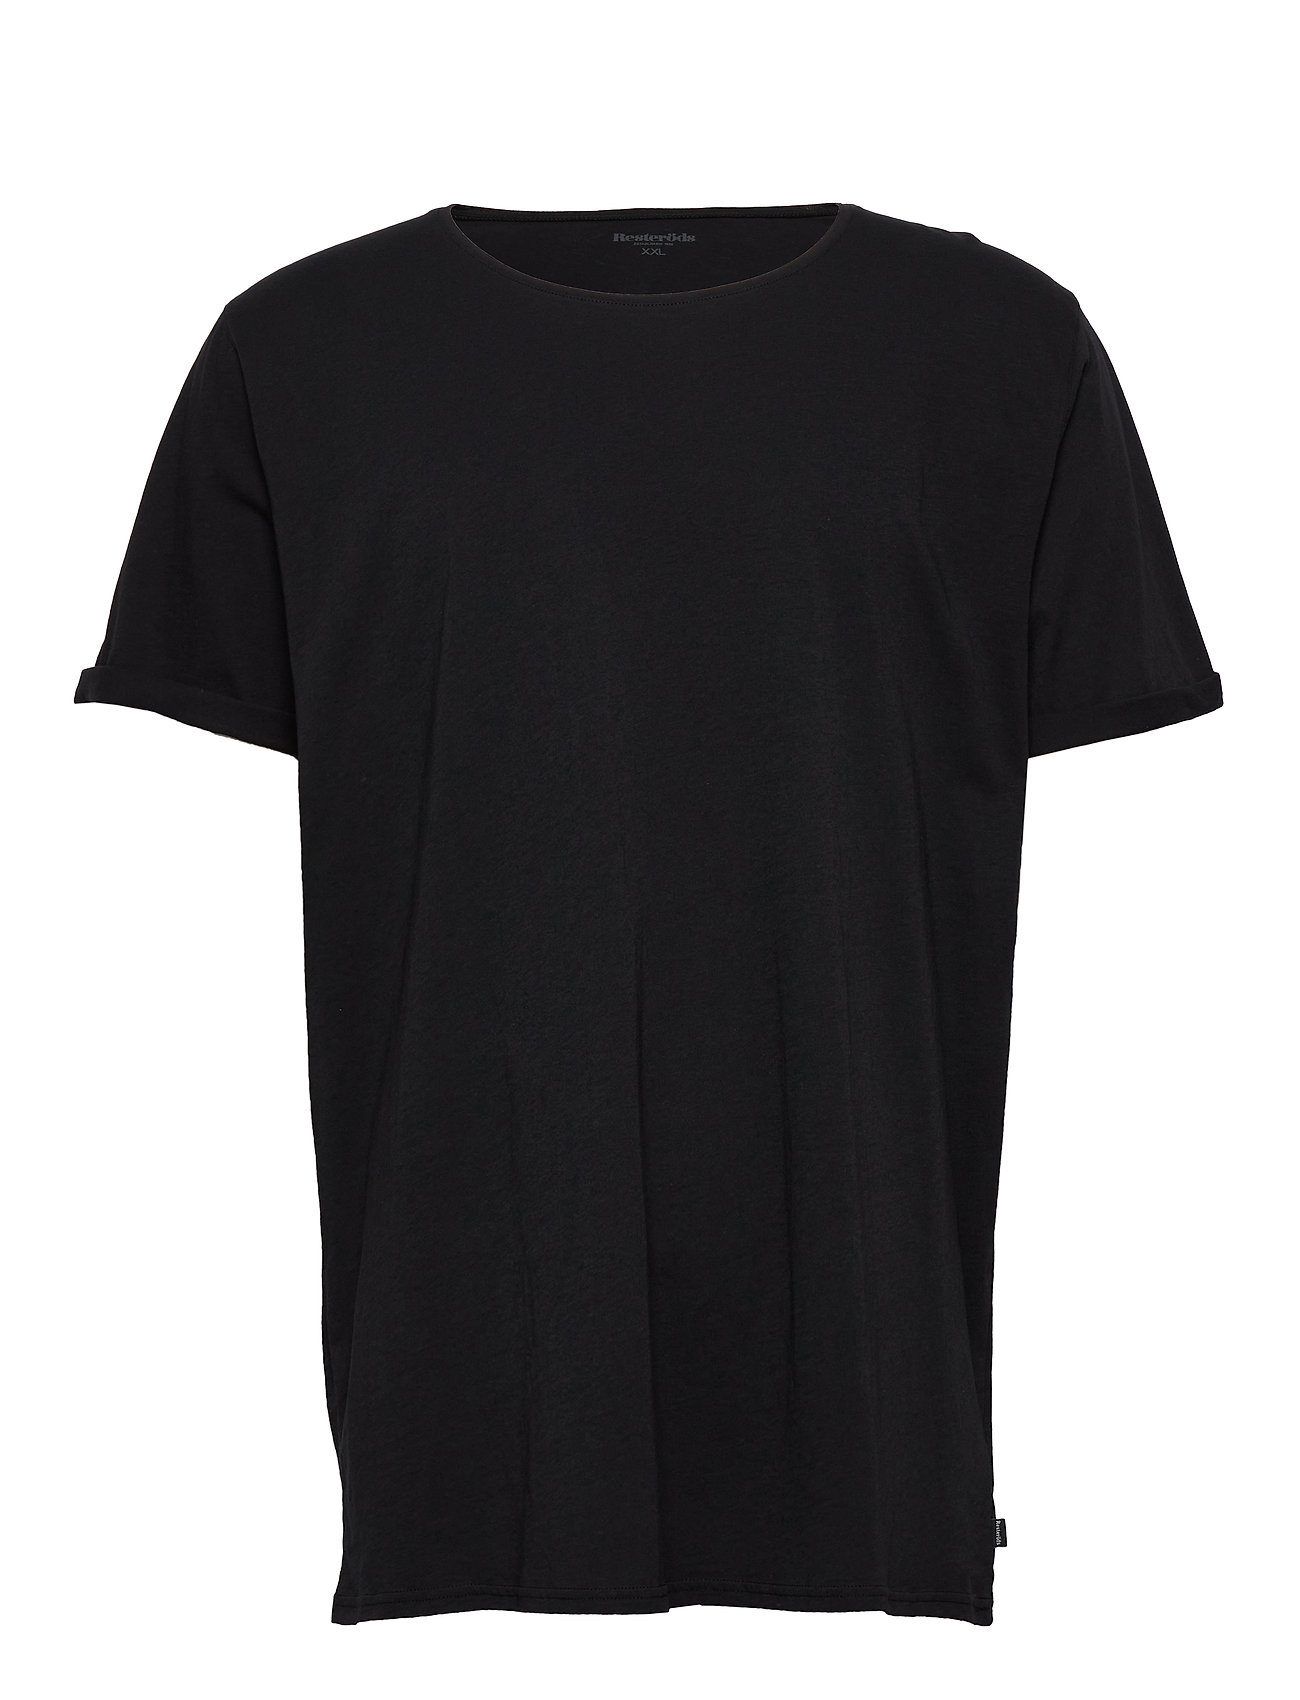 Image of Jimmy Solid T-shirt Multi/mønstret Resteröds (3421208353)